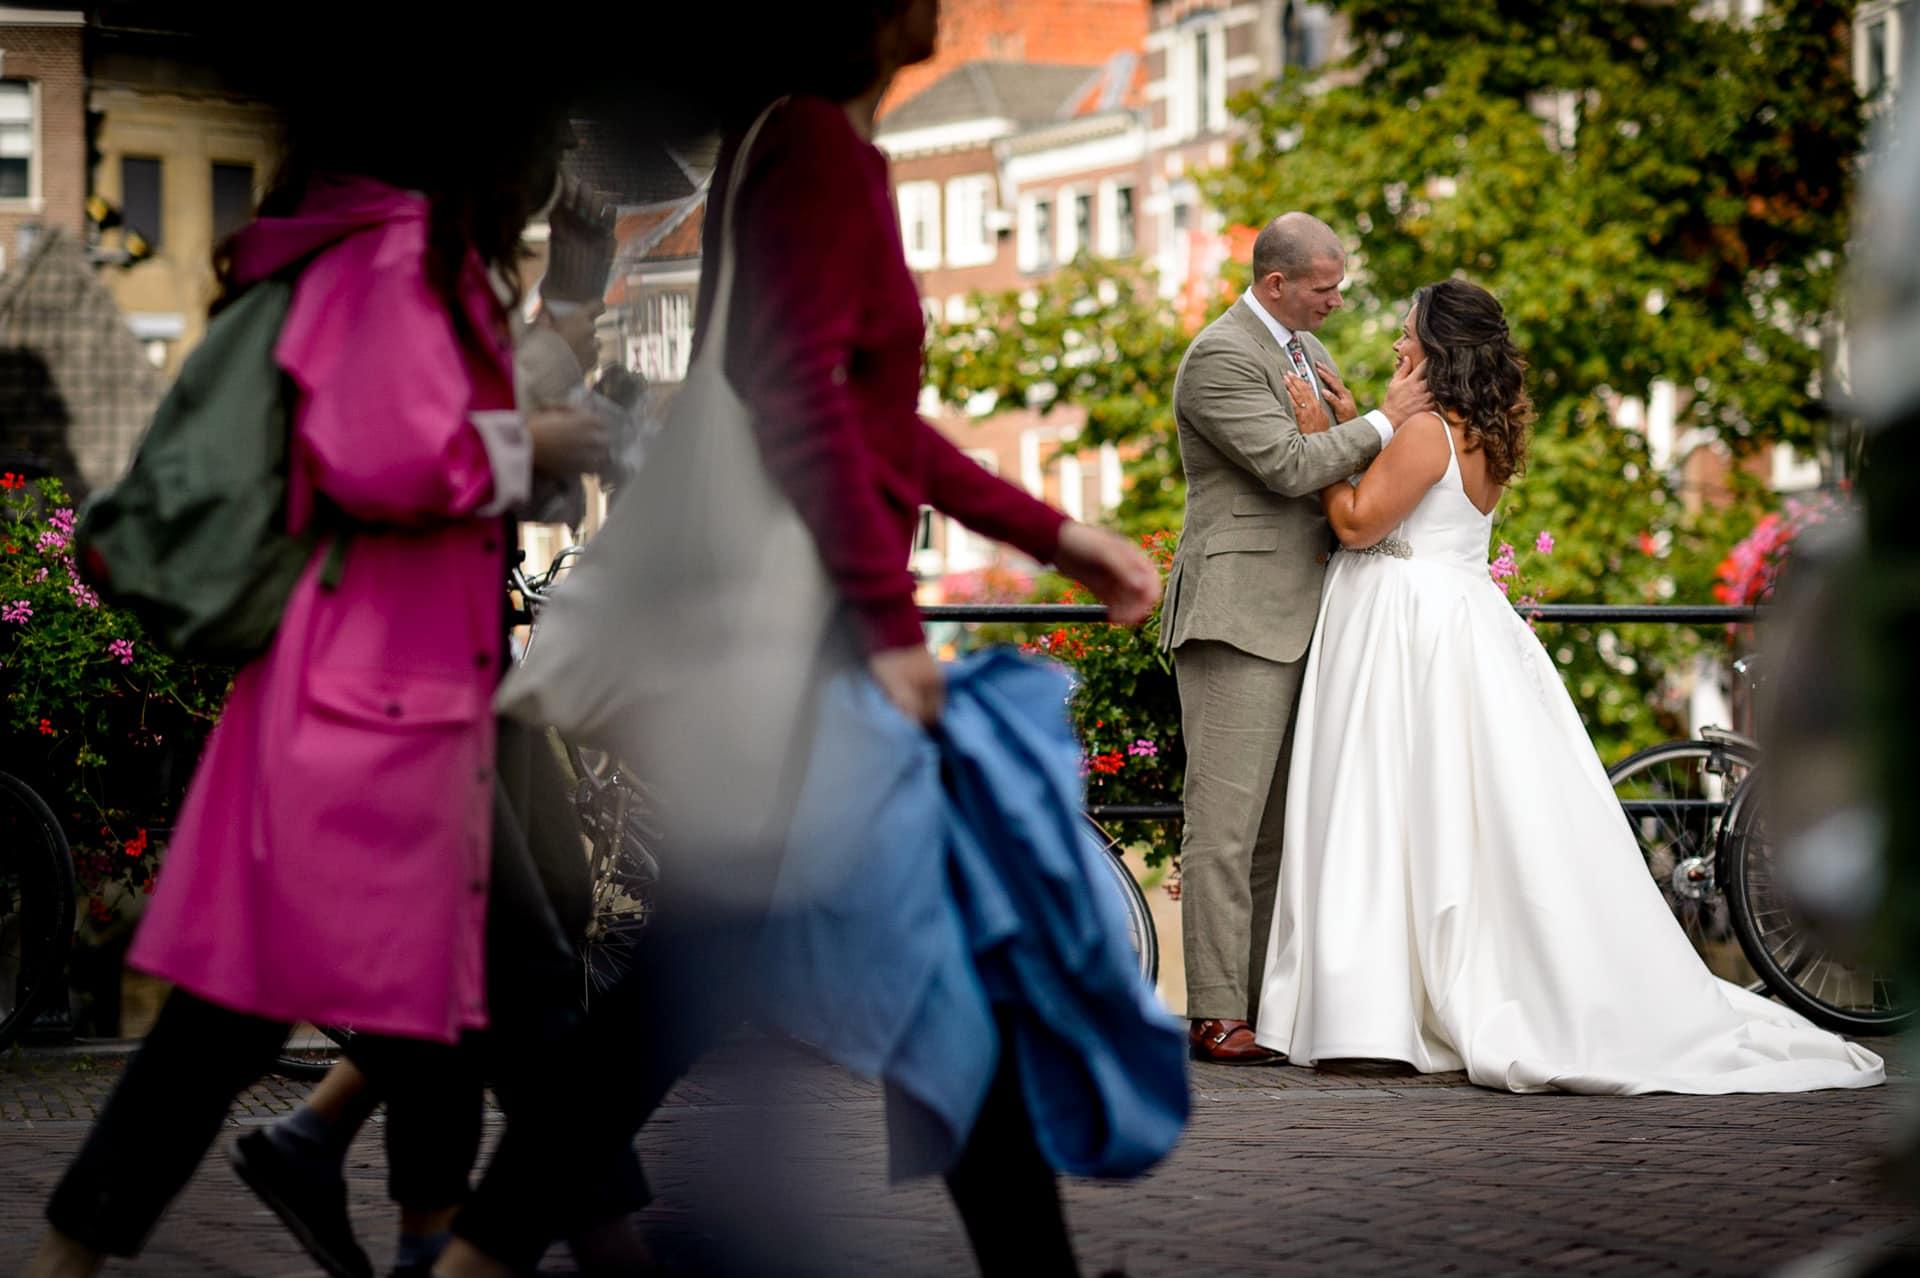 trouwen in utrecht